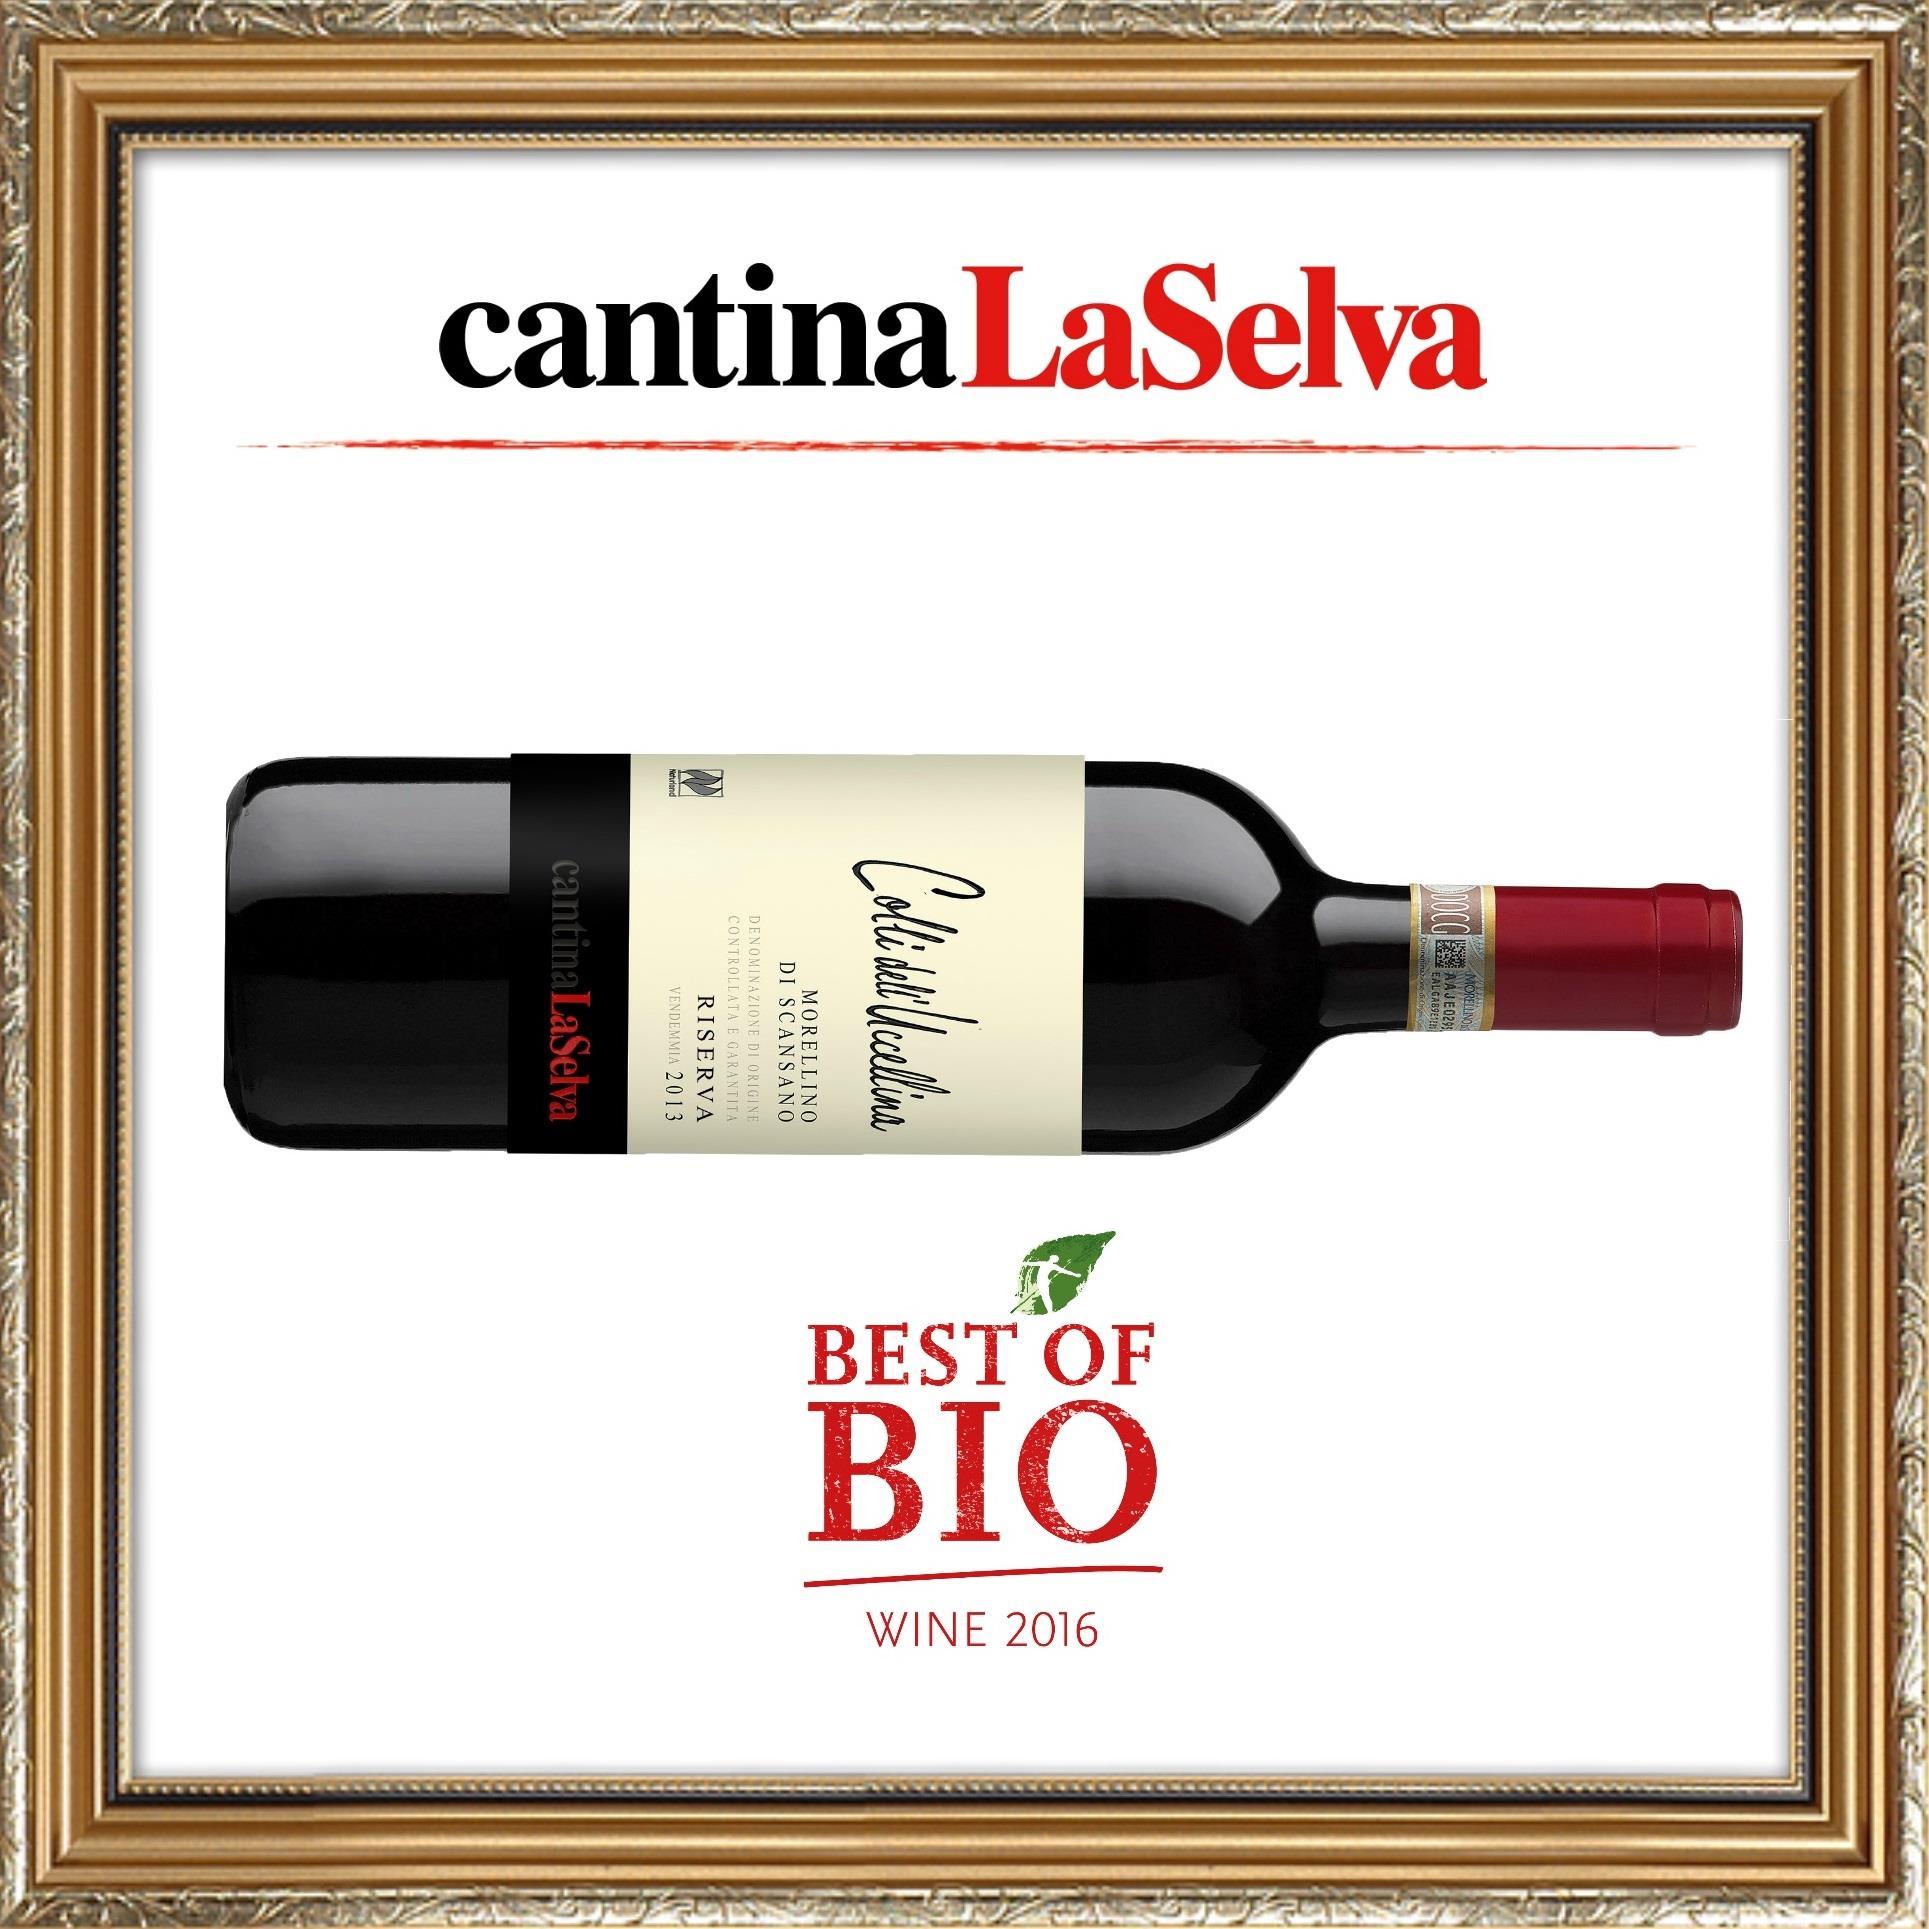 Best_of_Bio_wine